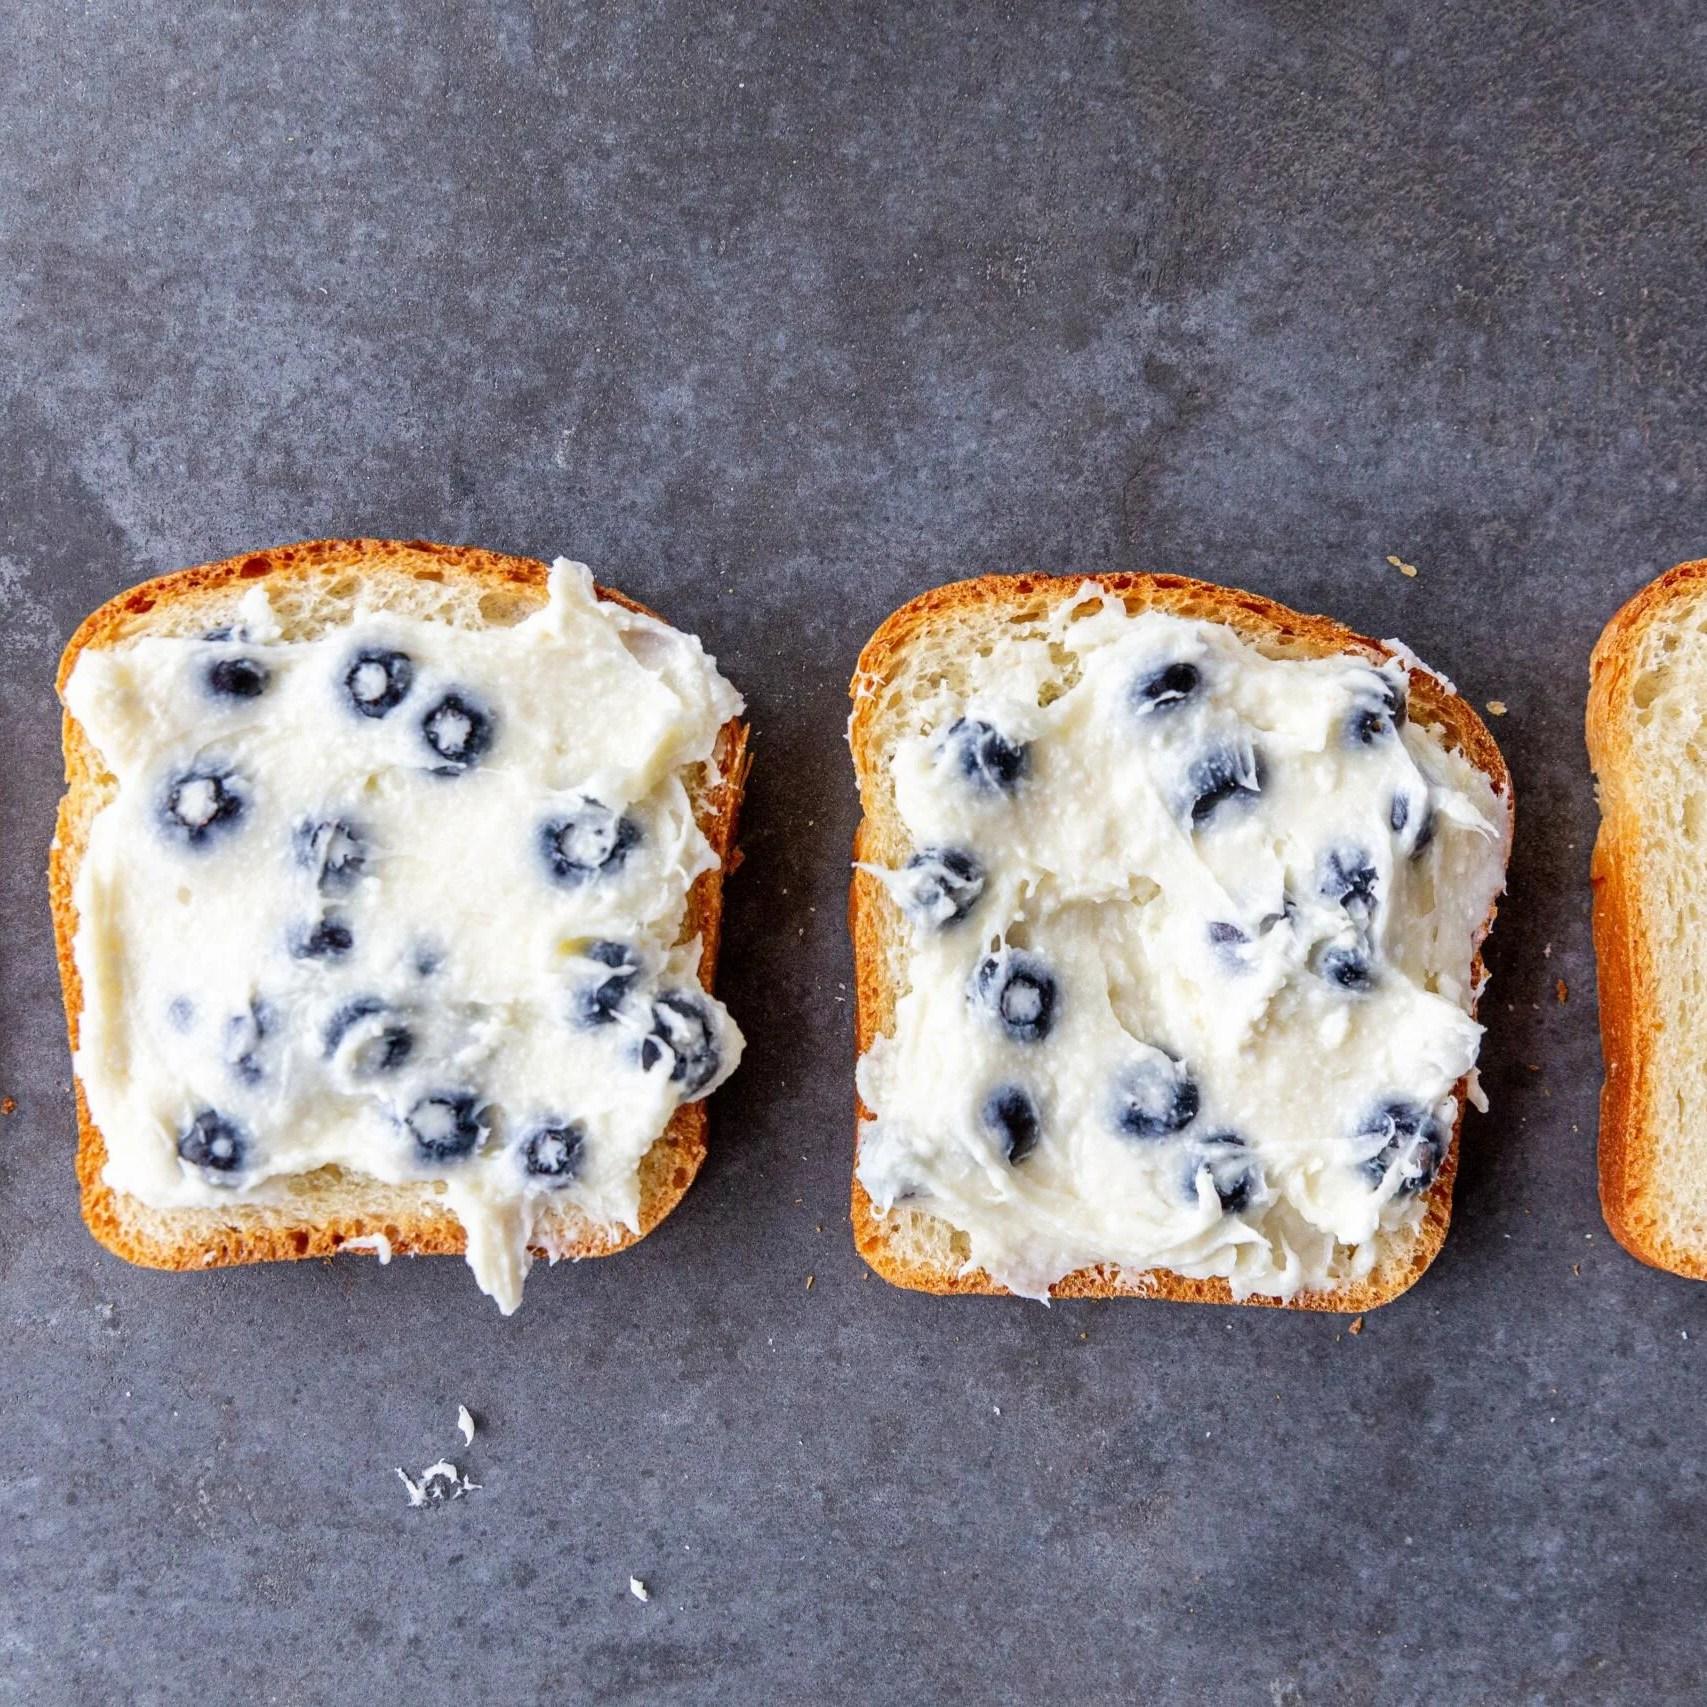 cream cheese on a toast